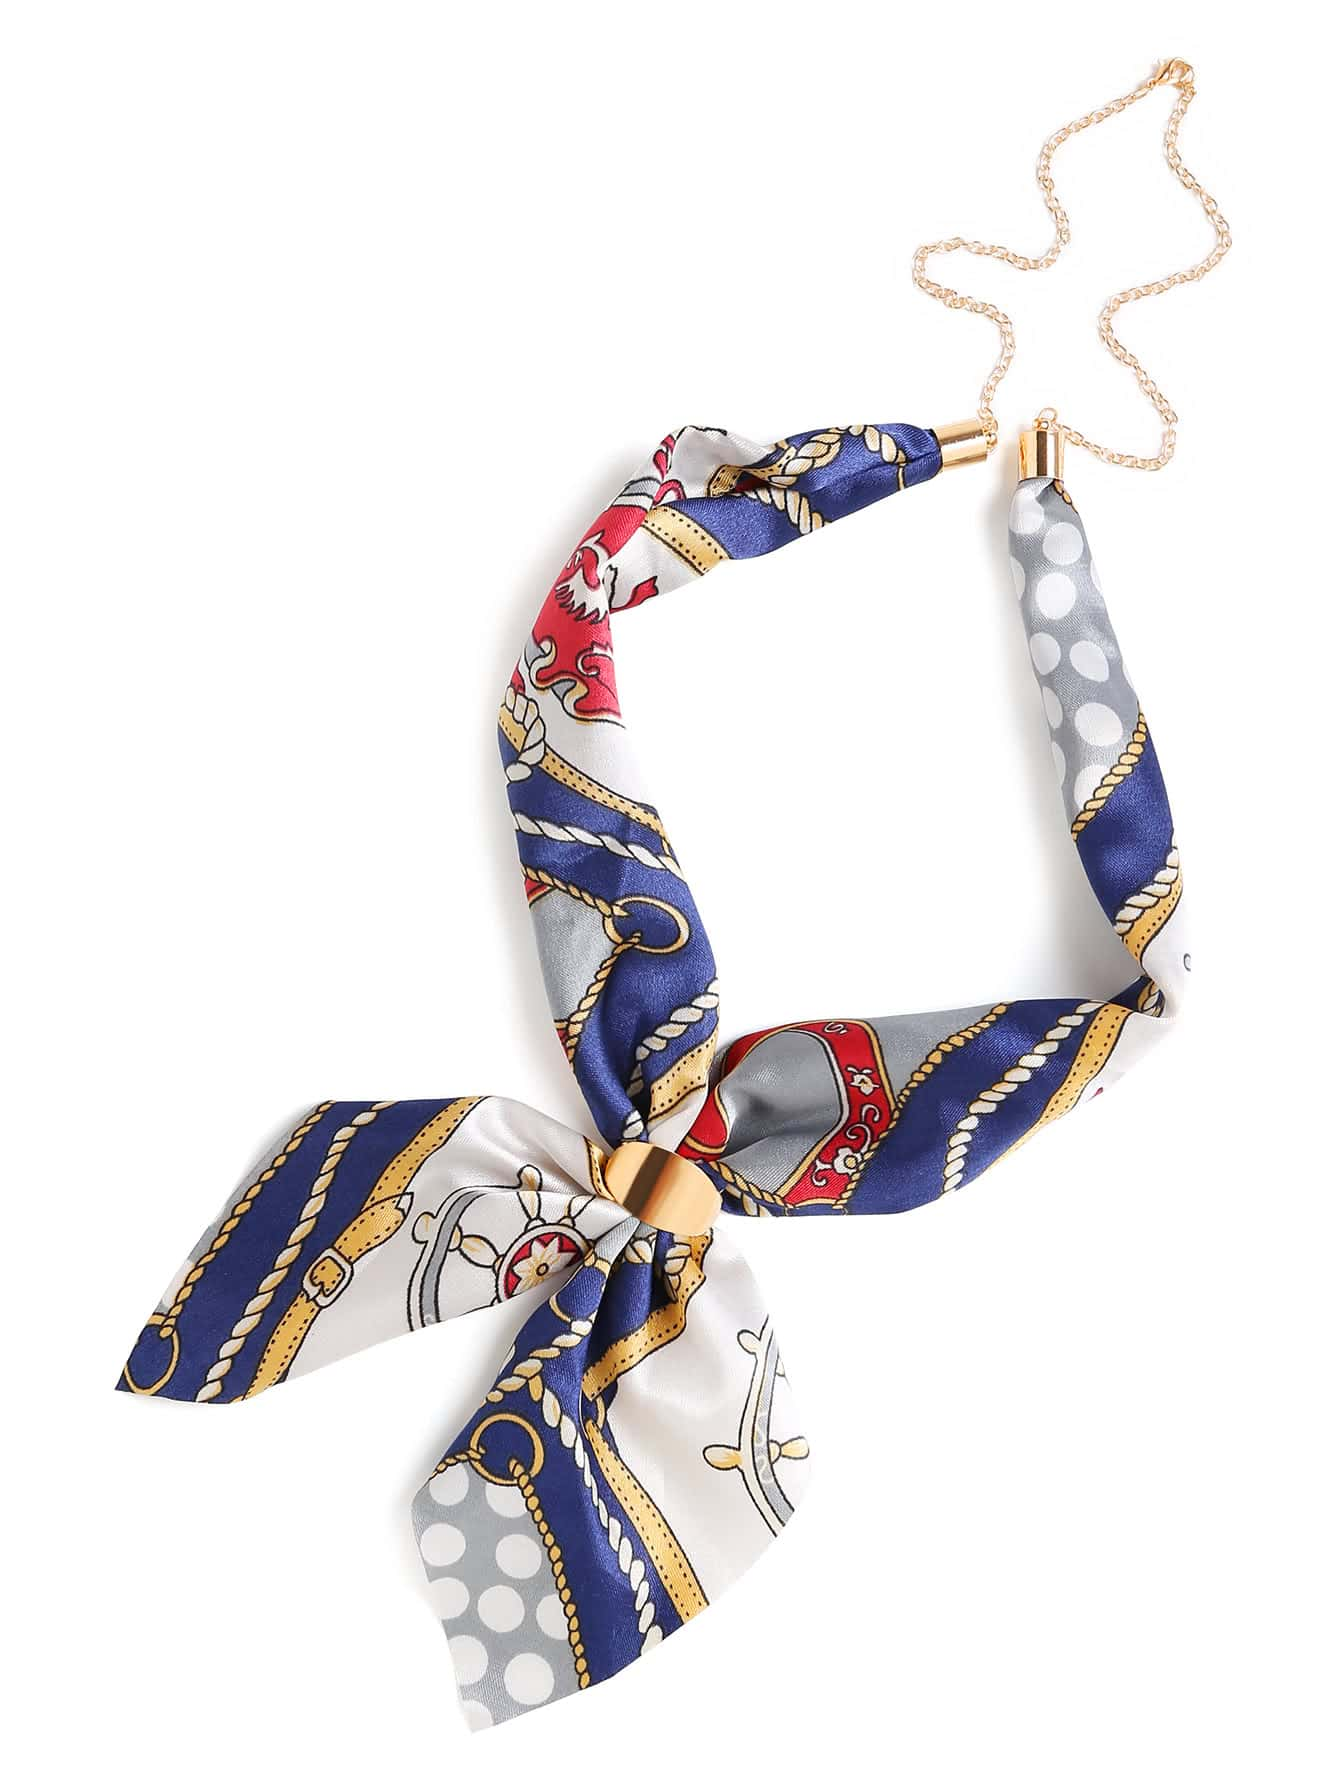 Chain Linked Satin Neckerchief